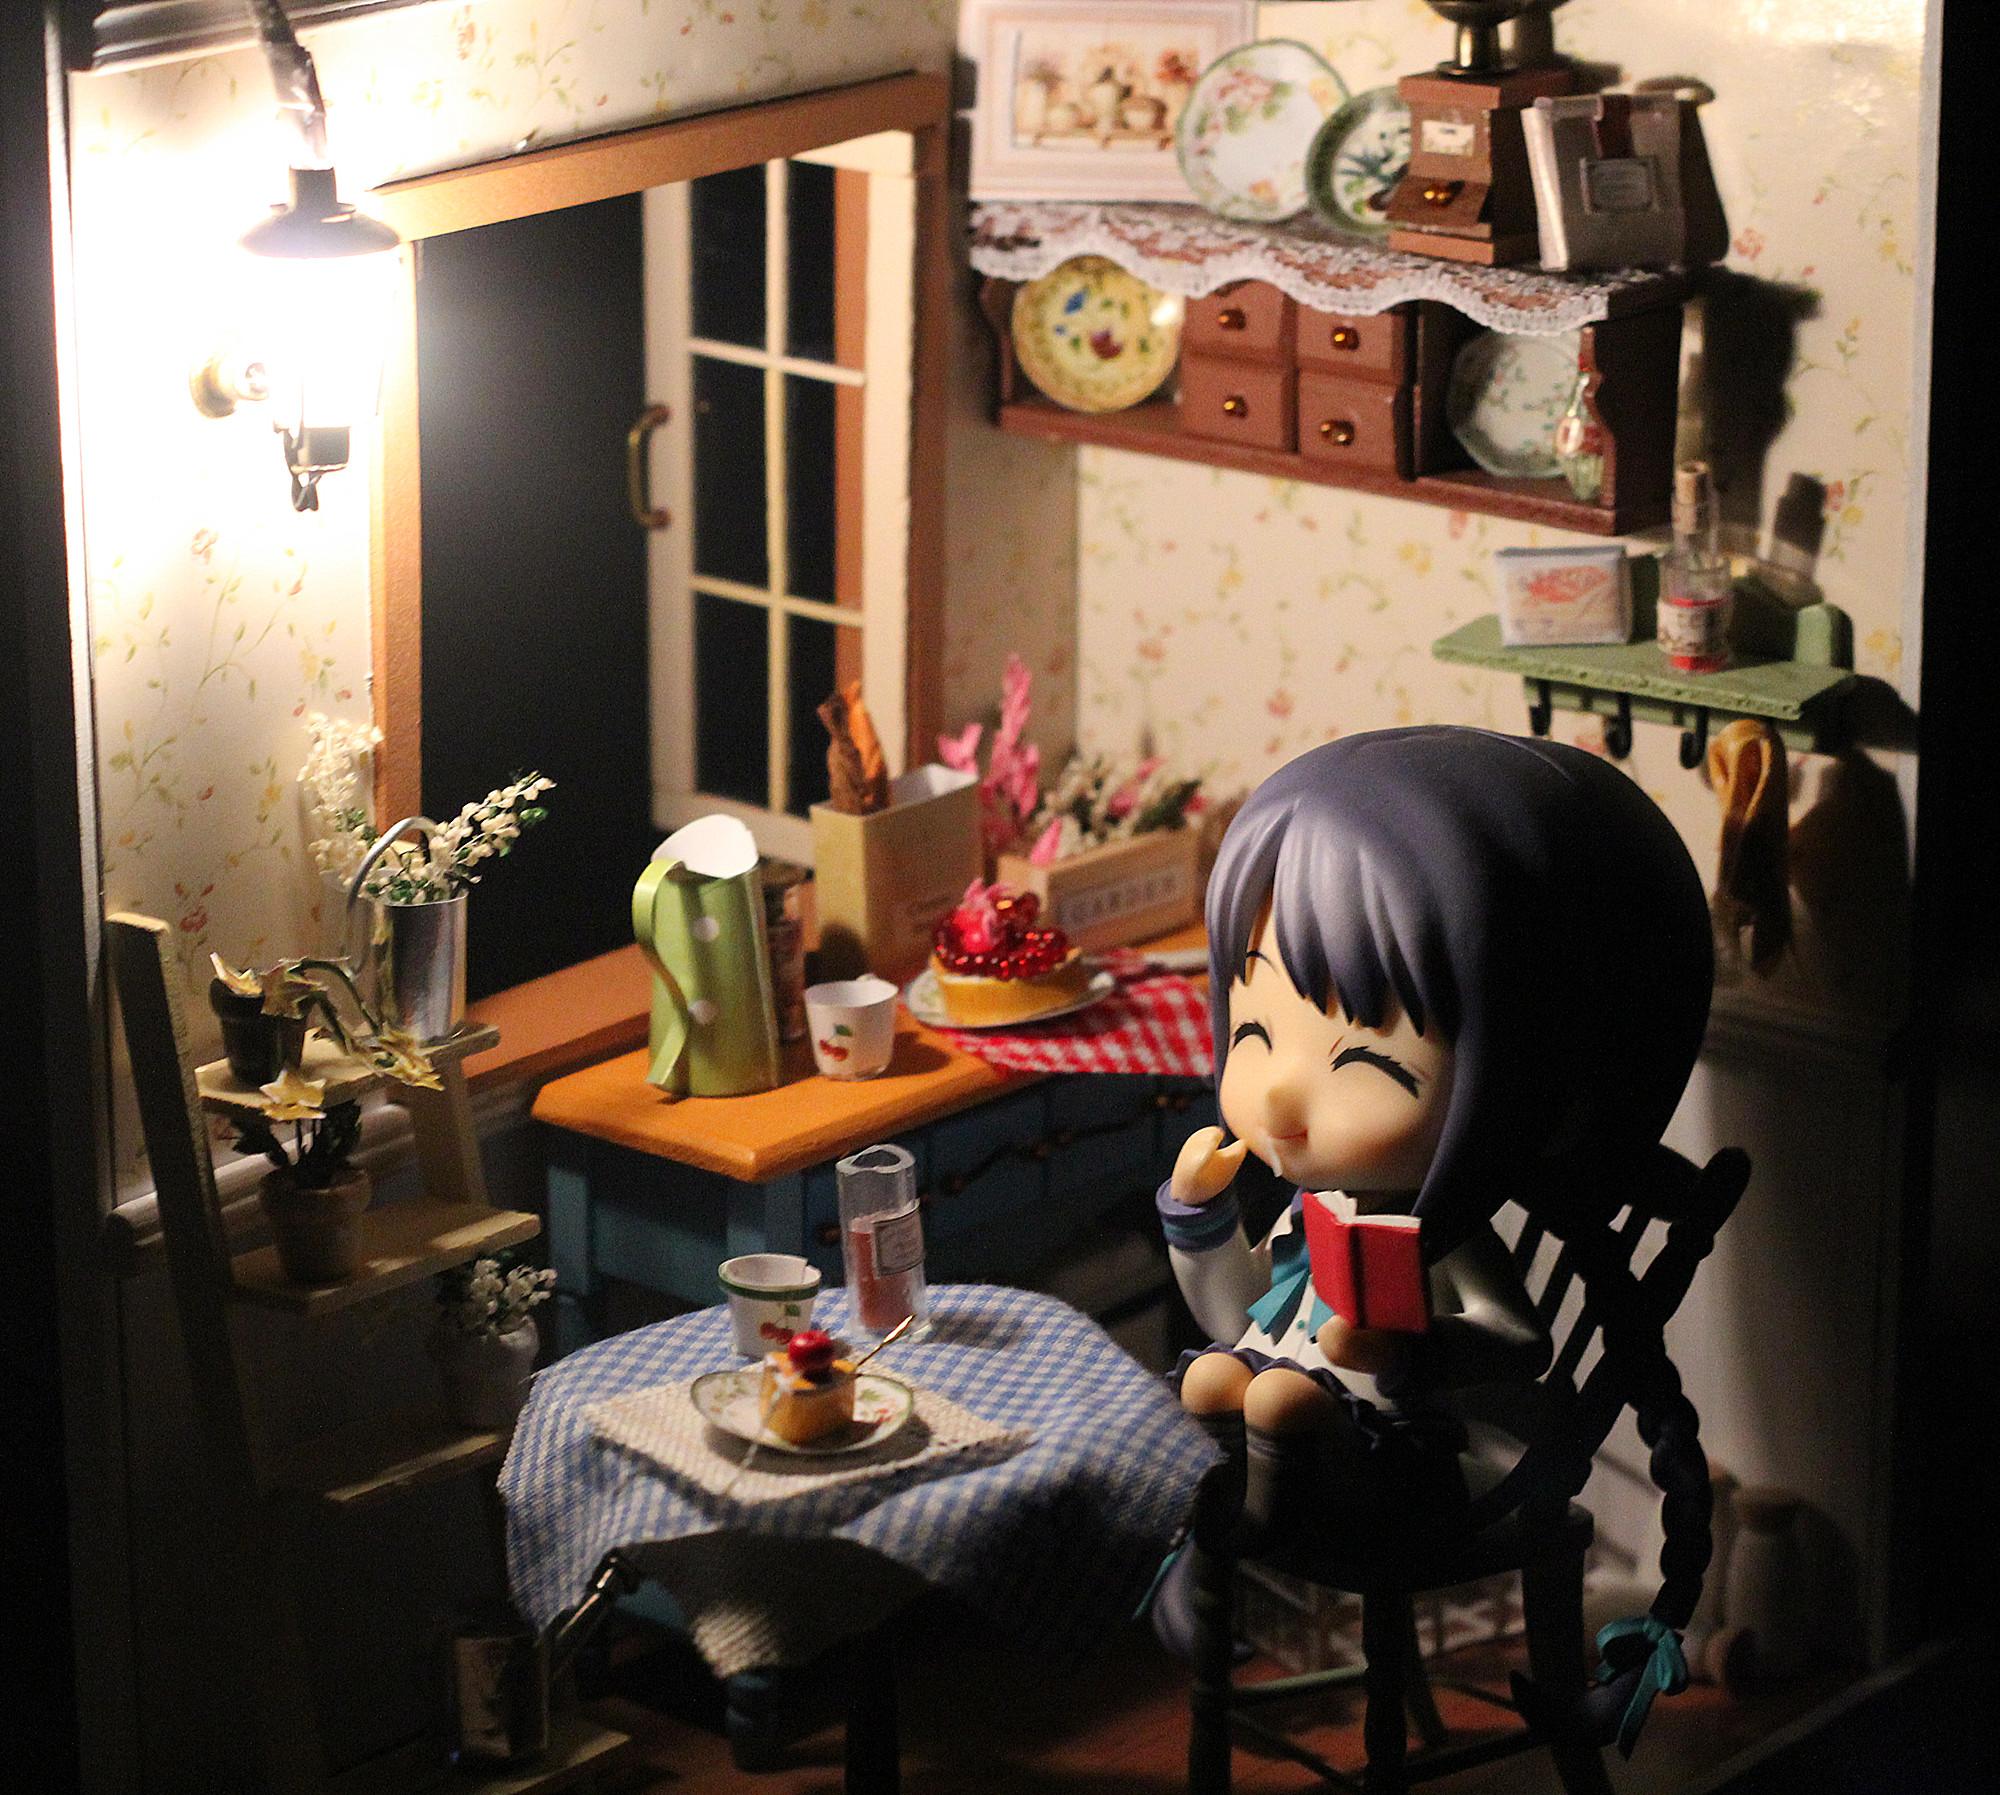 nendoroid good_smile_company amano_tooko bungaku_shoujo udono_kazuyoshi